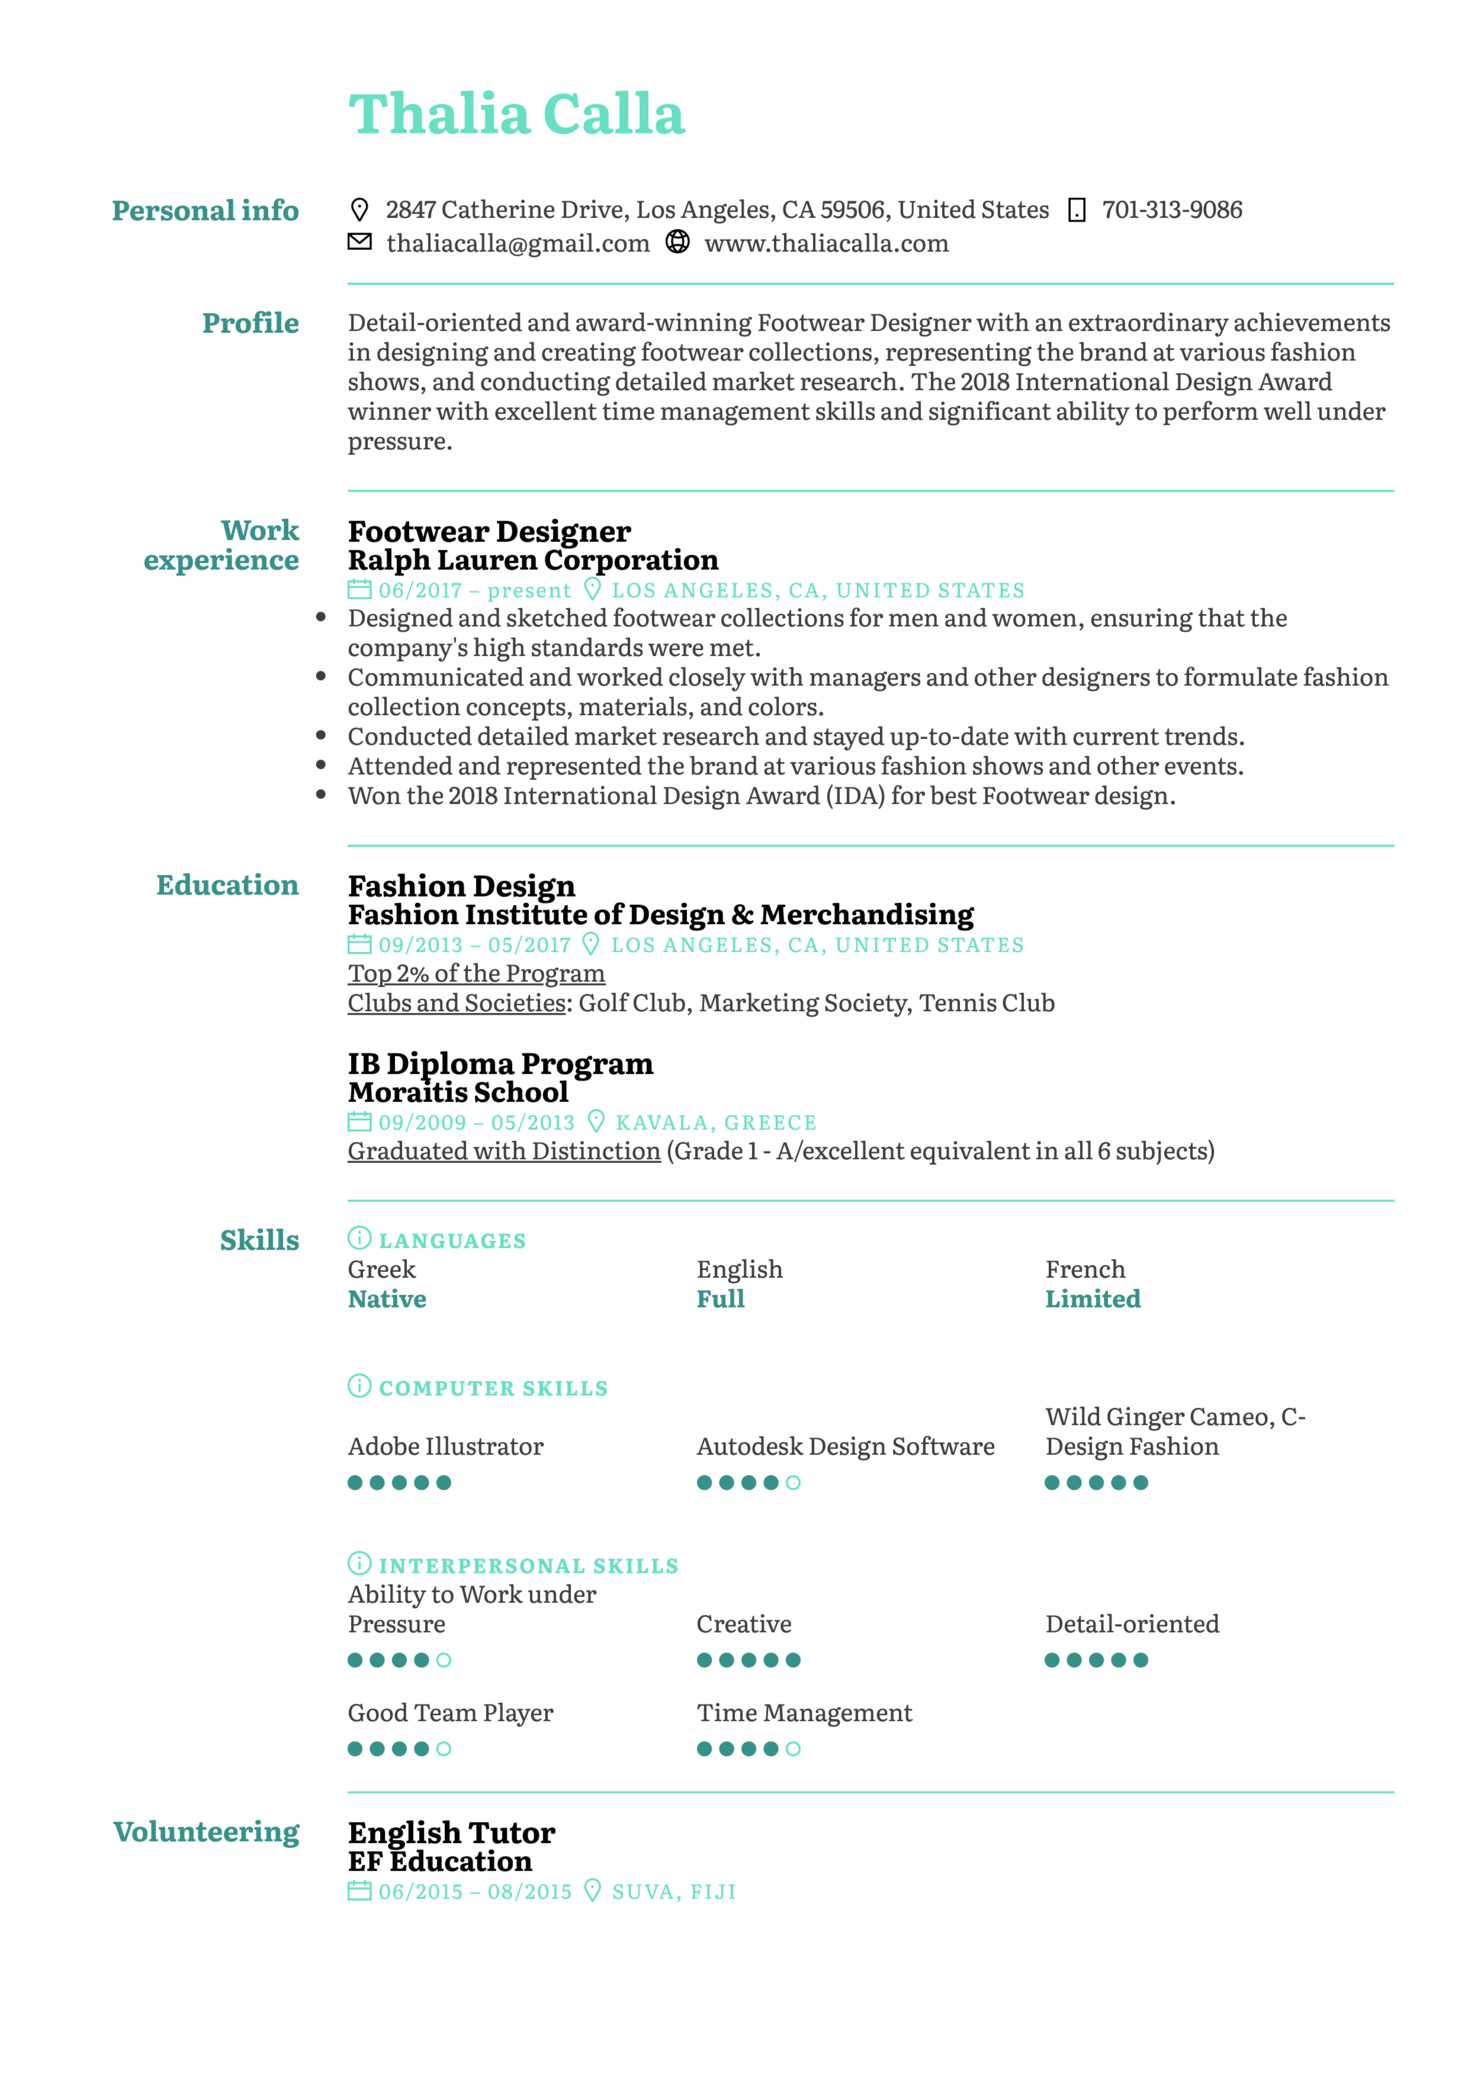 Footwear Designer Resume Sample (parte 1)